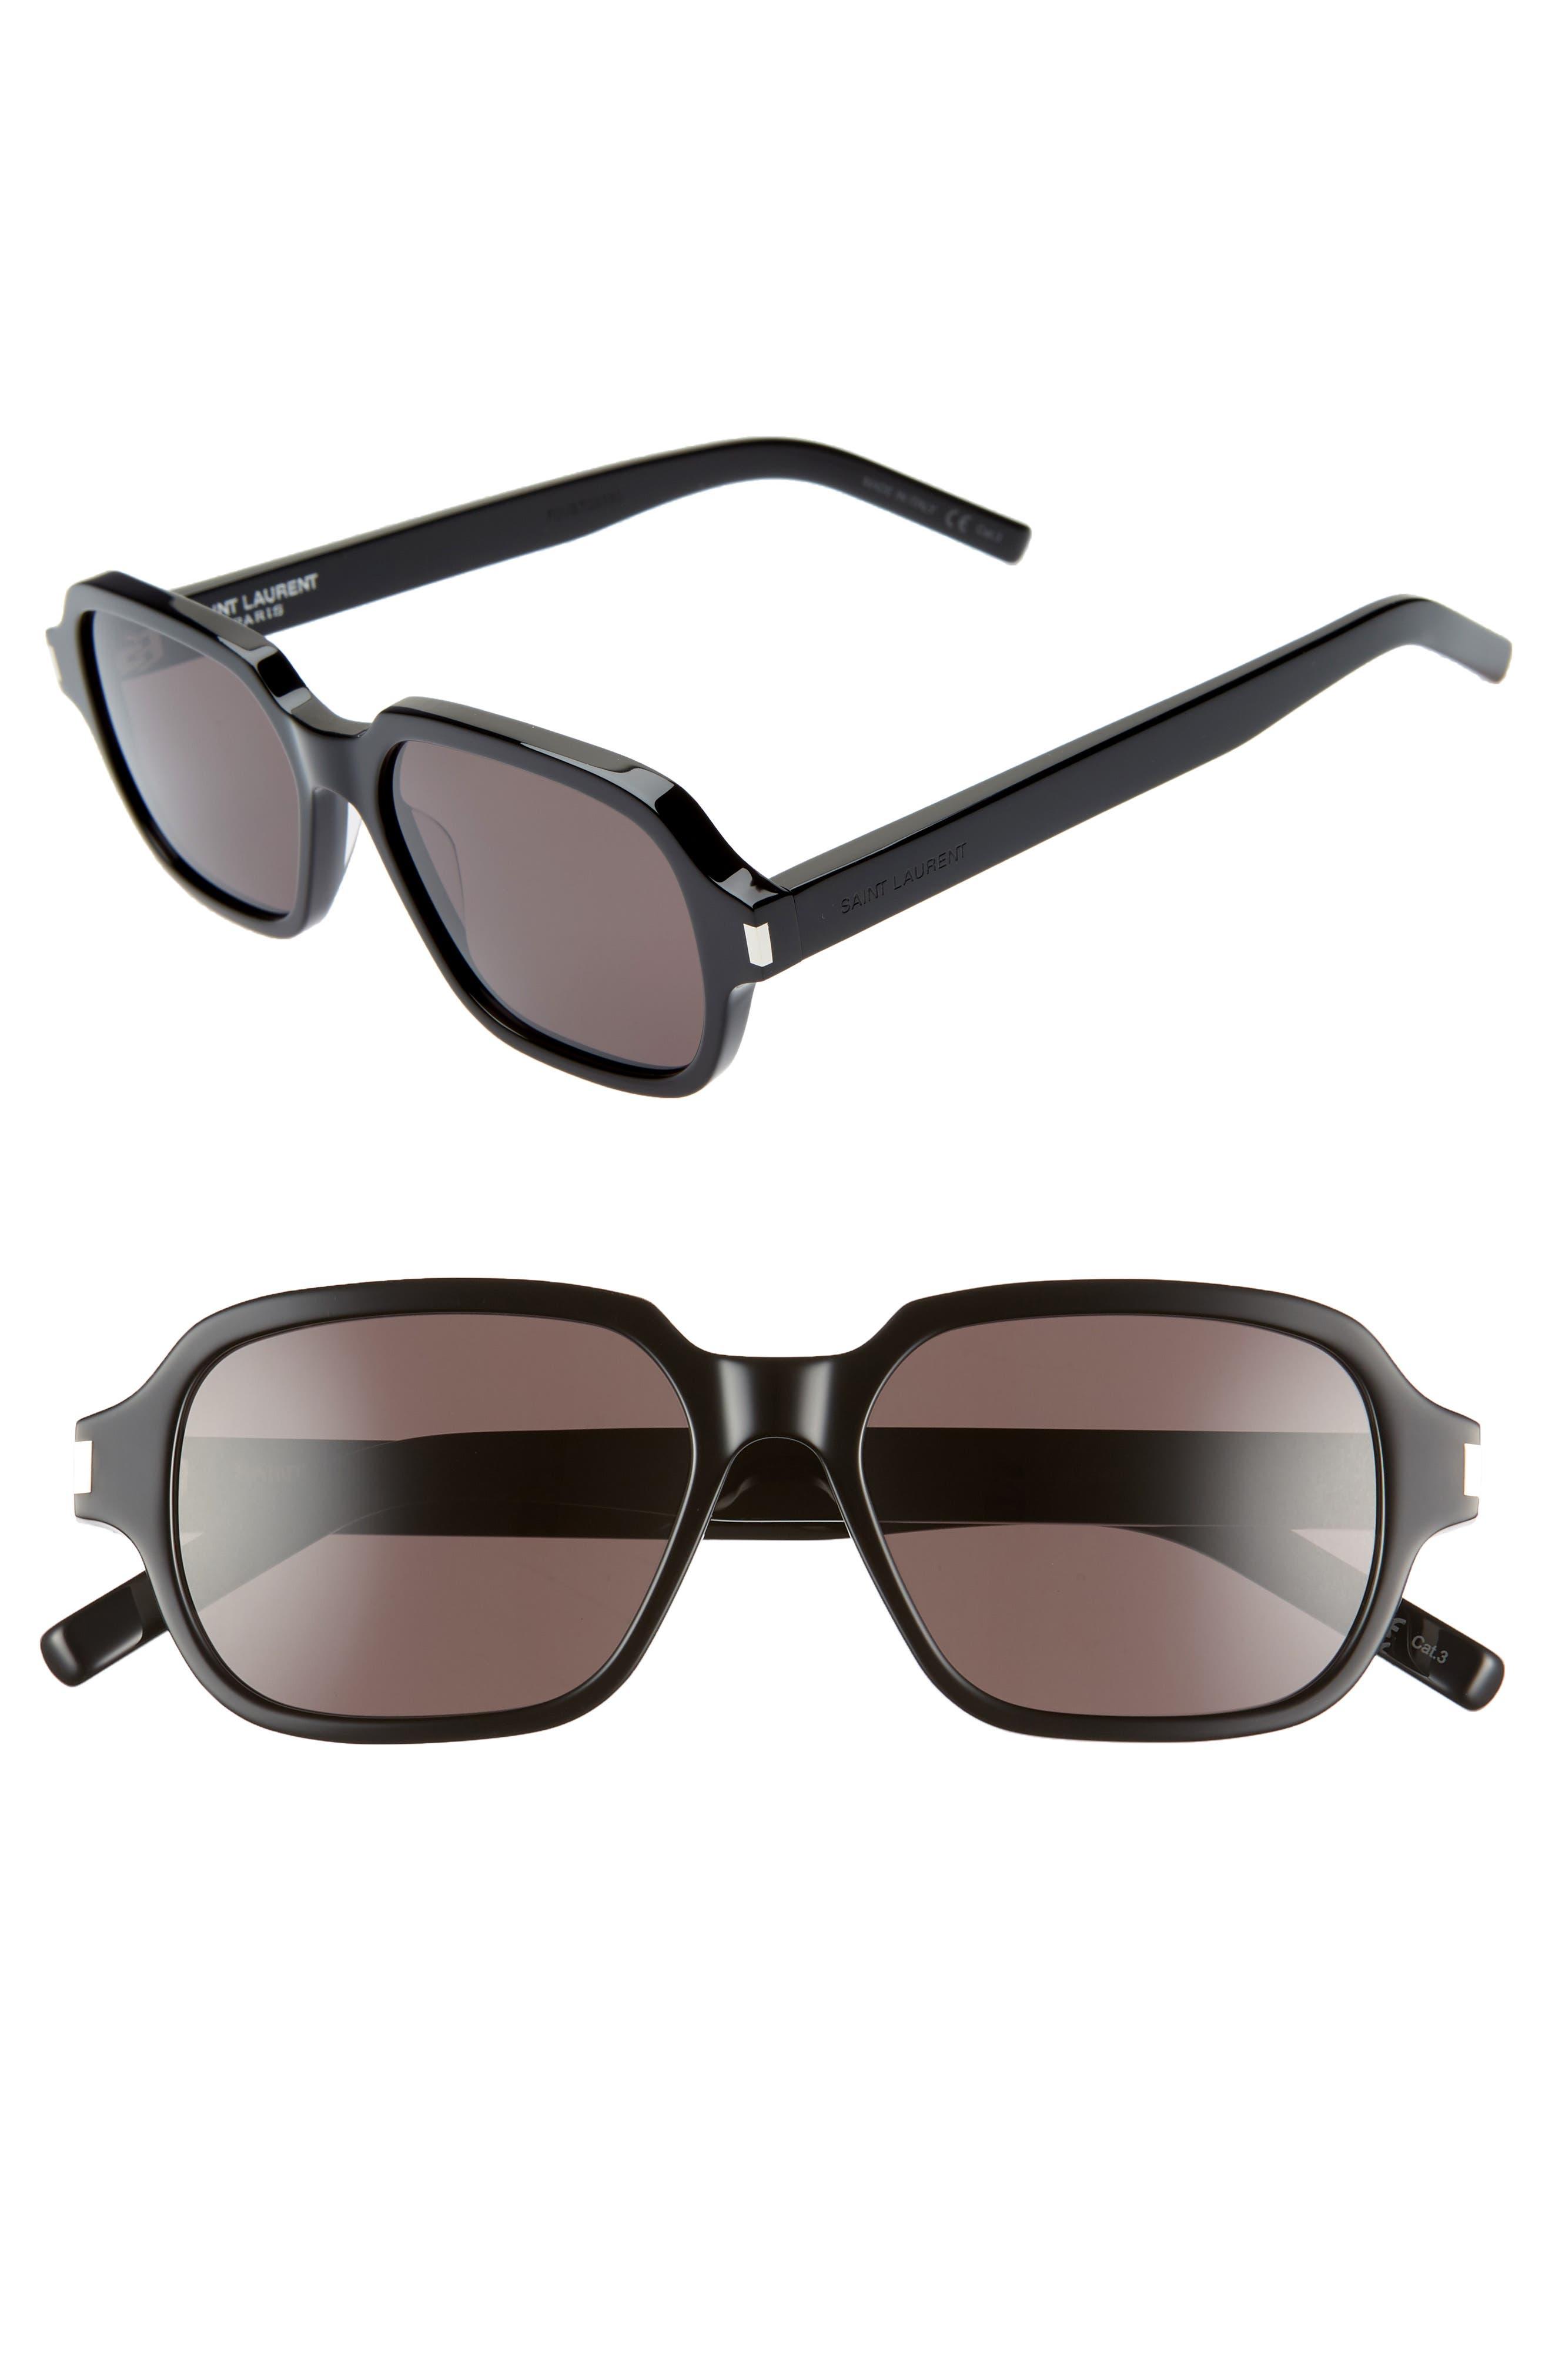 SAINT LAURENT, 53mm Rectangle Sunglasses, Main thumbnail 1, color, SHINY BLACK/ GREY SOLID